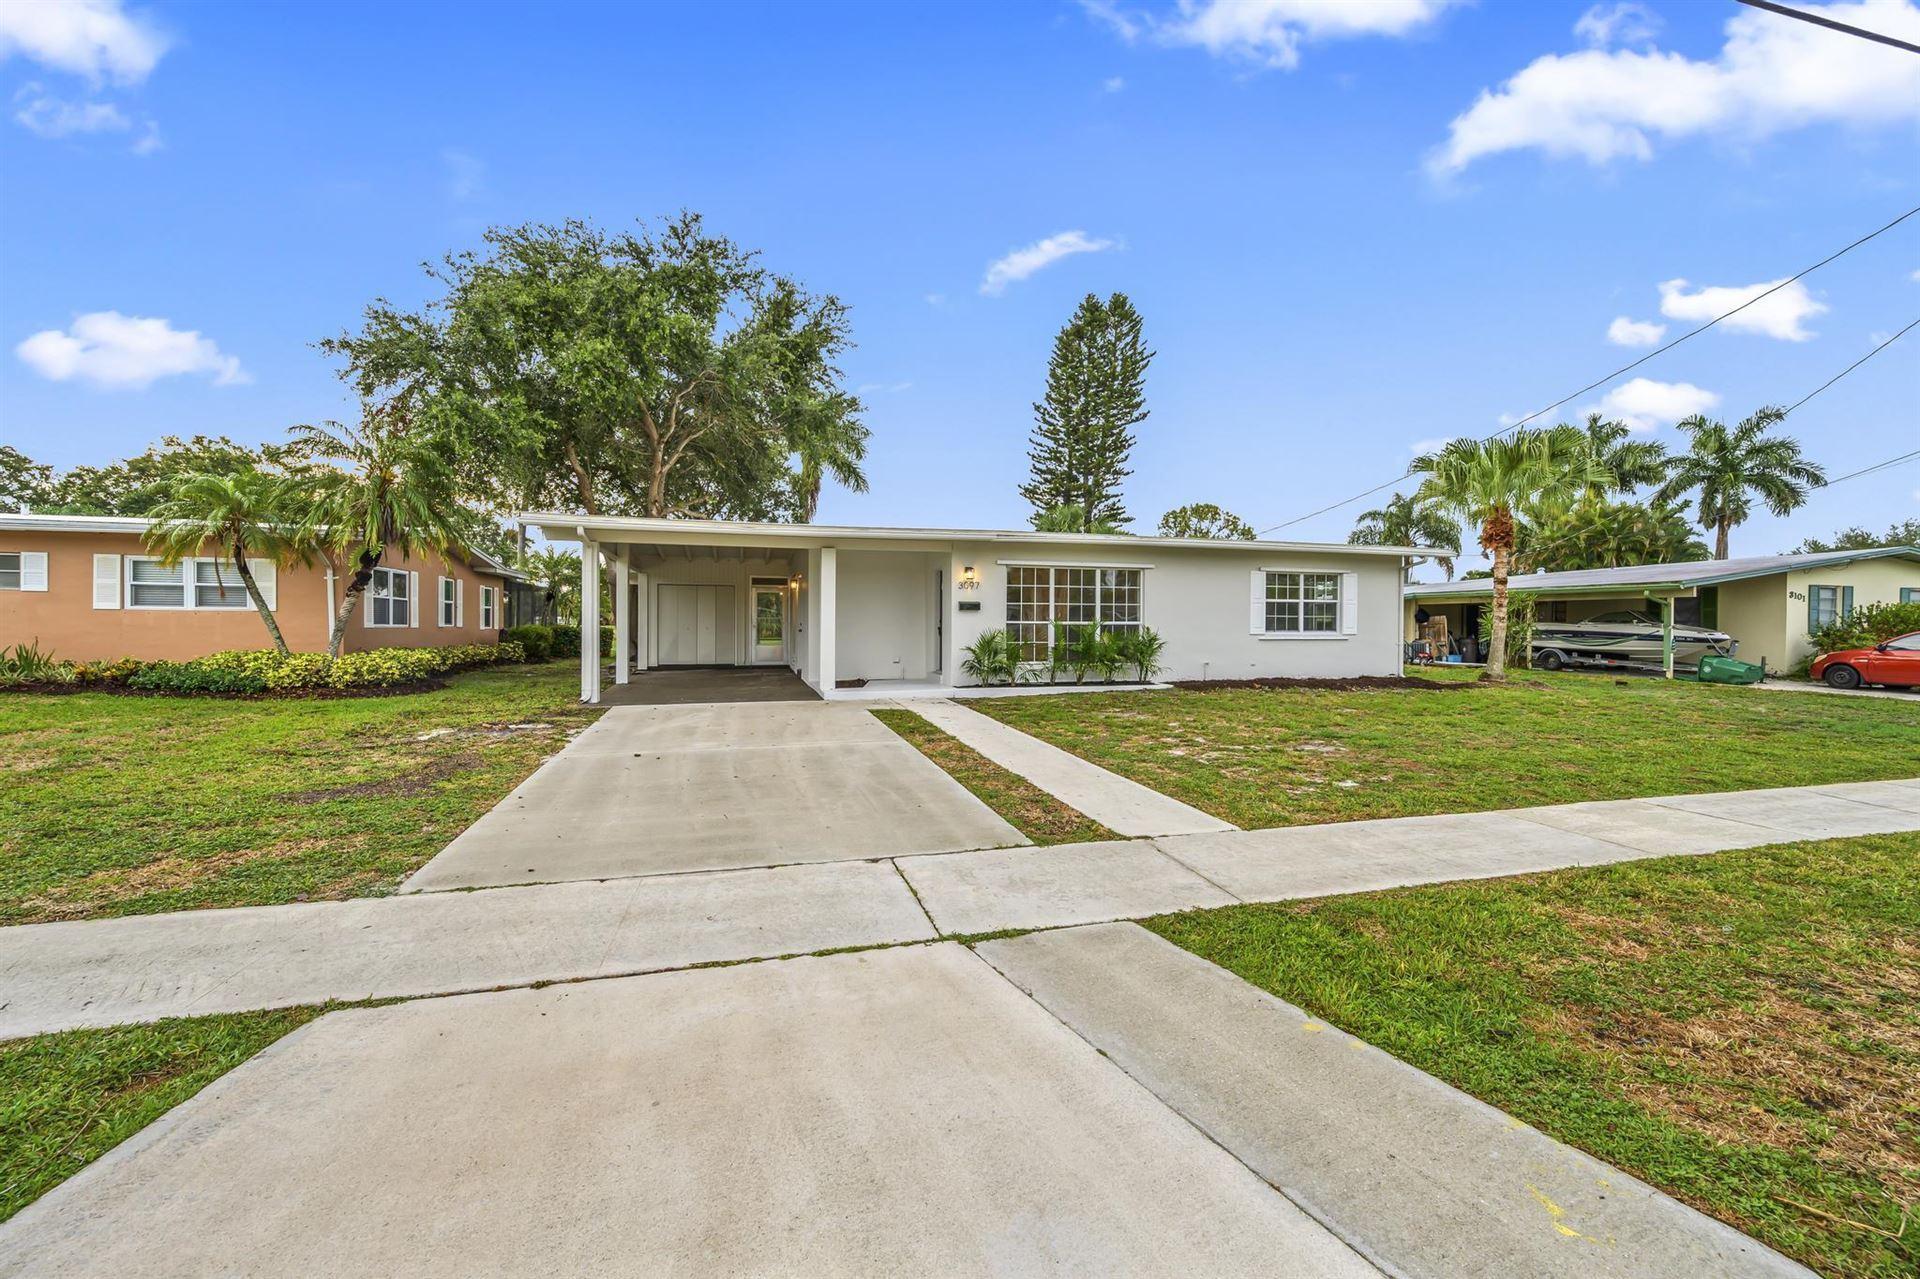 3097 SE Morningside Blvd Boulevard, Port Saint Lucie, FL 34953 - #: RX-10725155